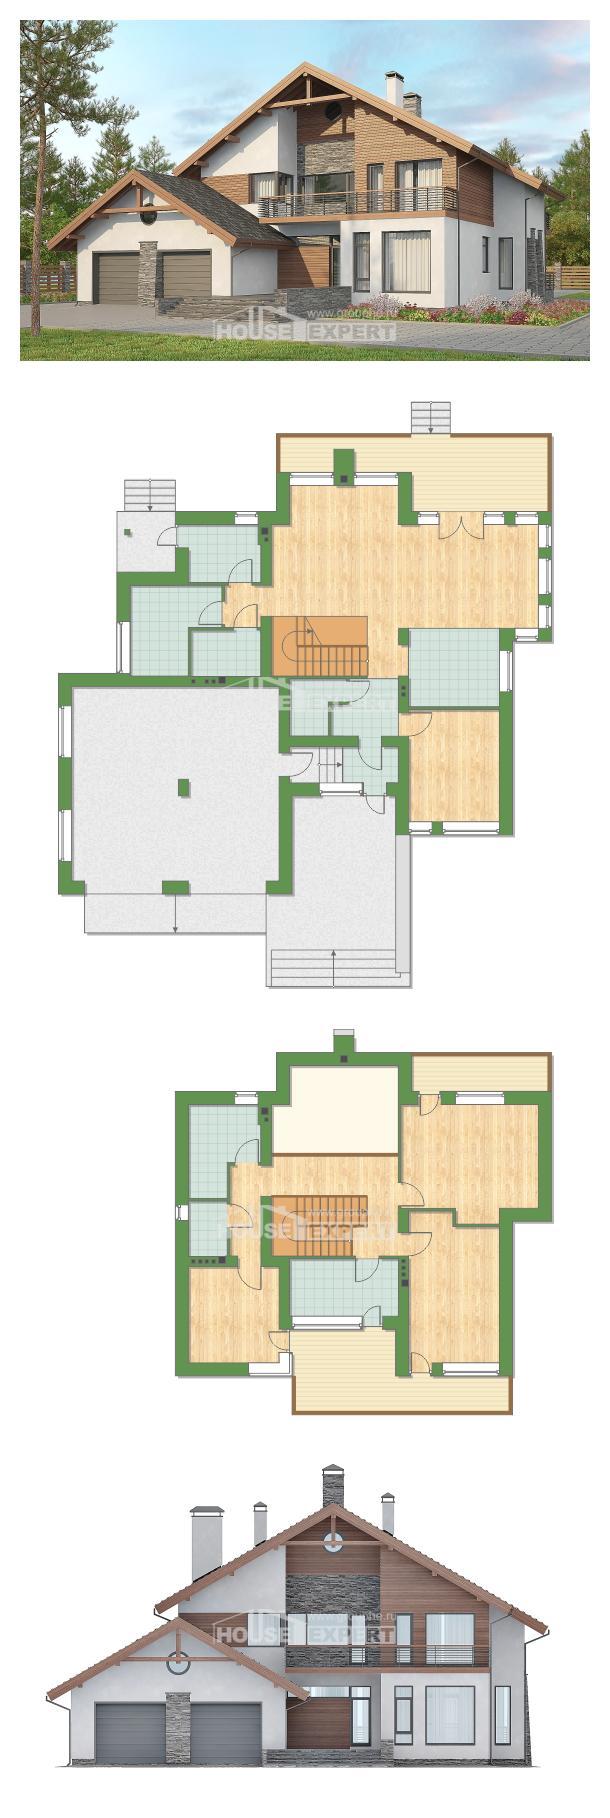 Proyecto de casa 270-003-L | House Expert